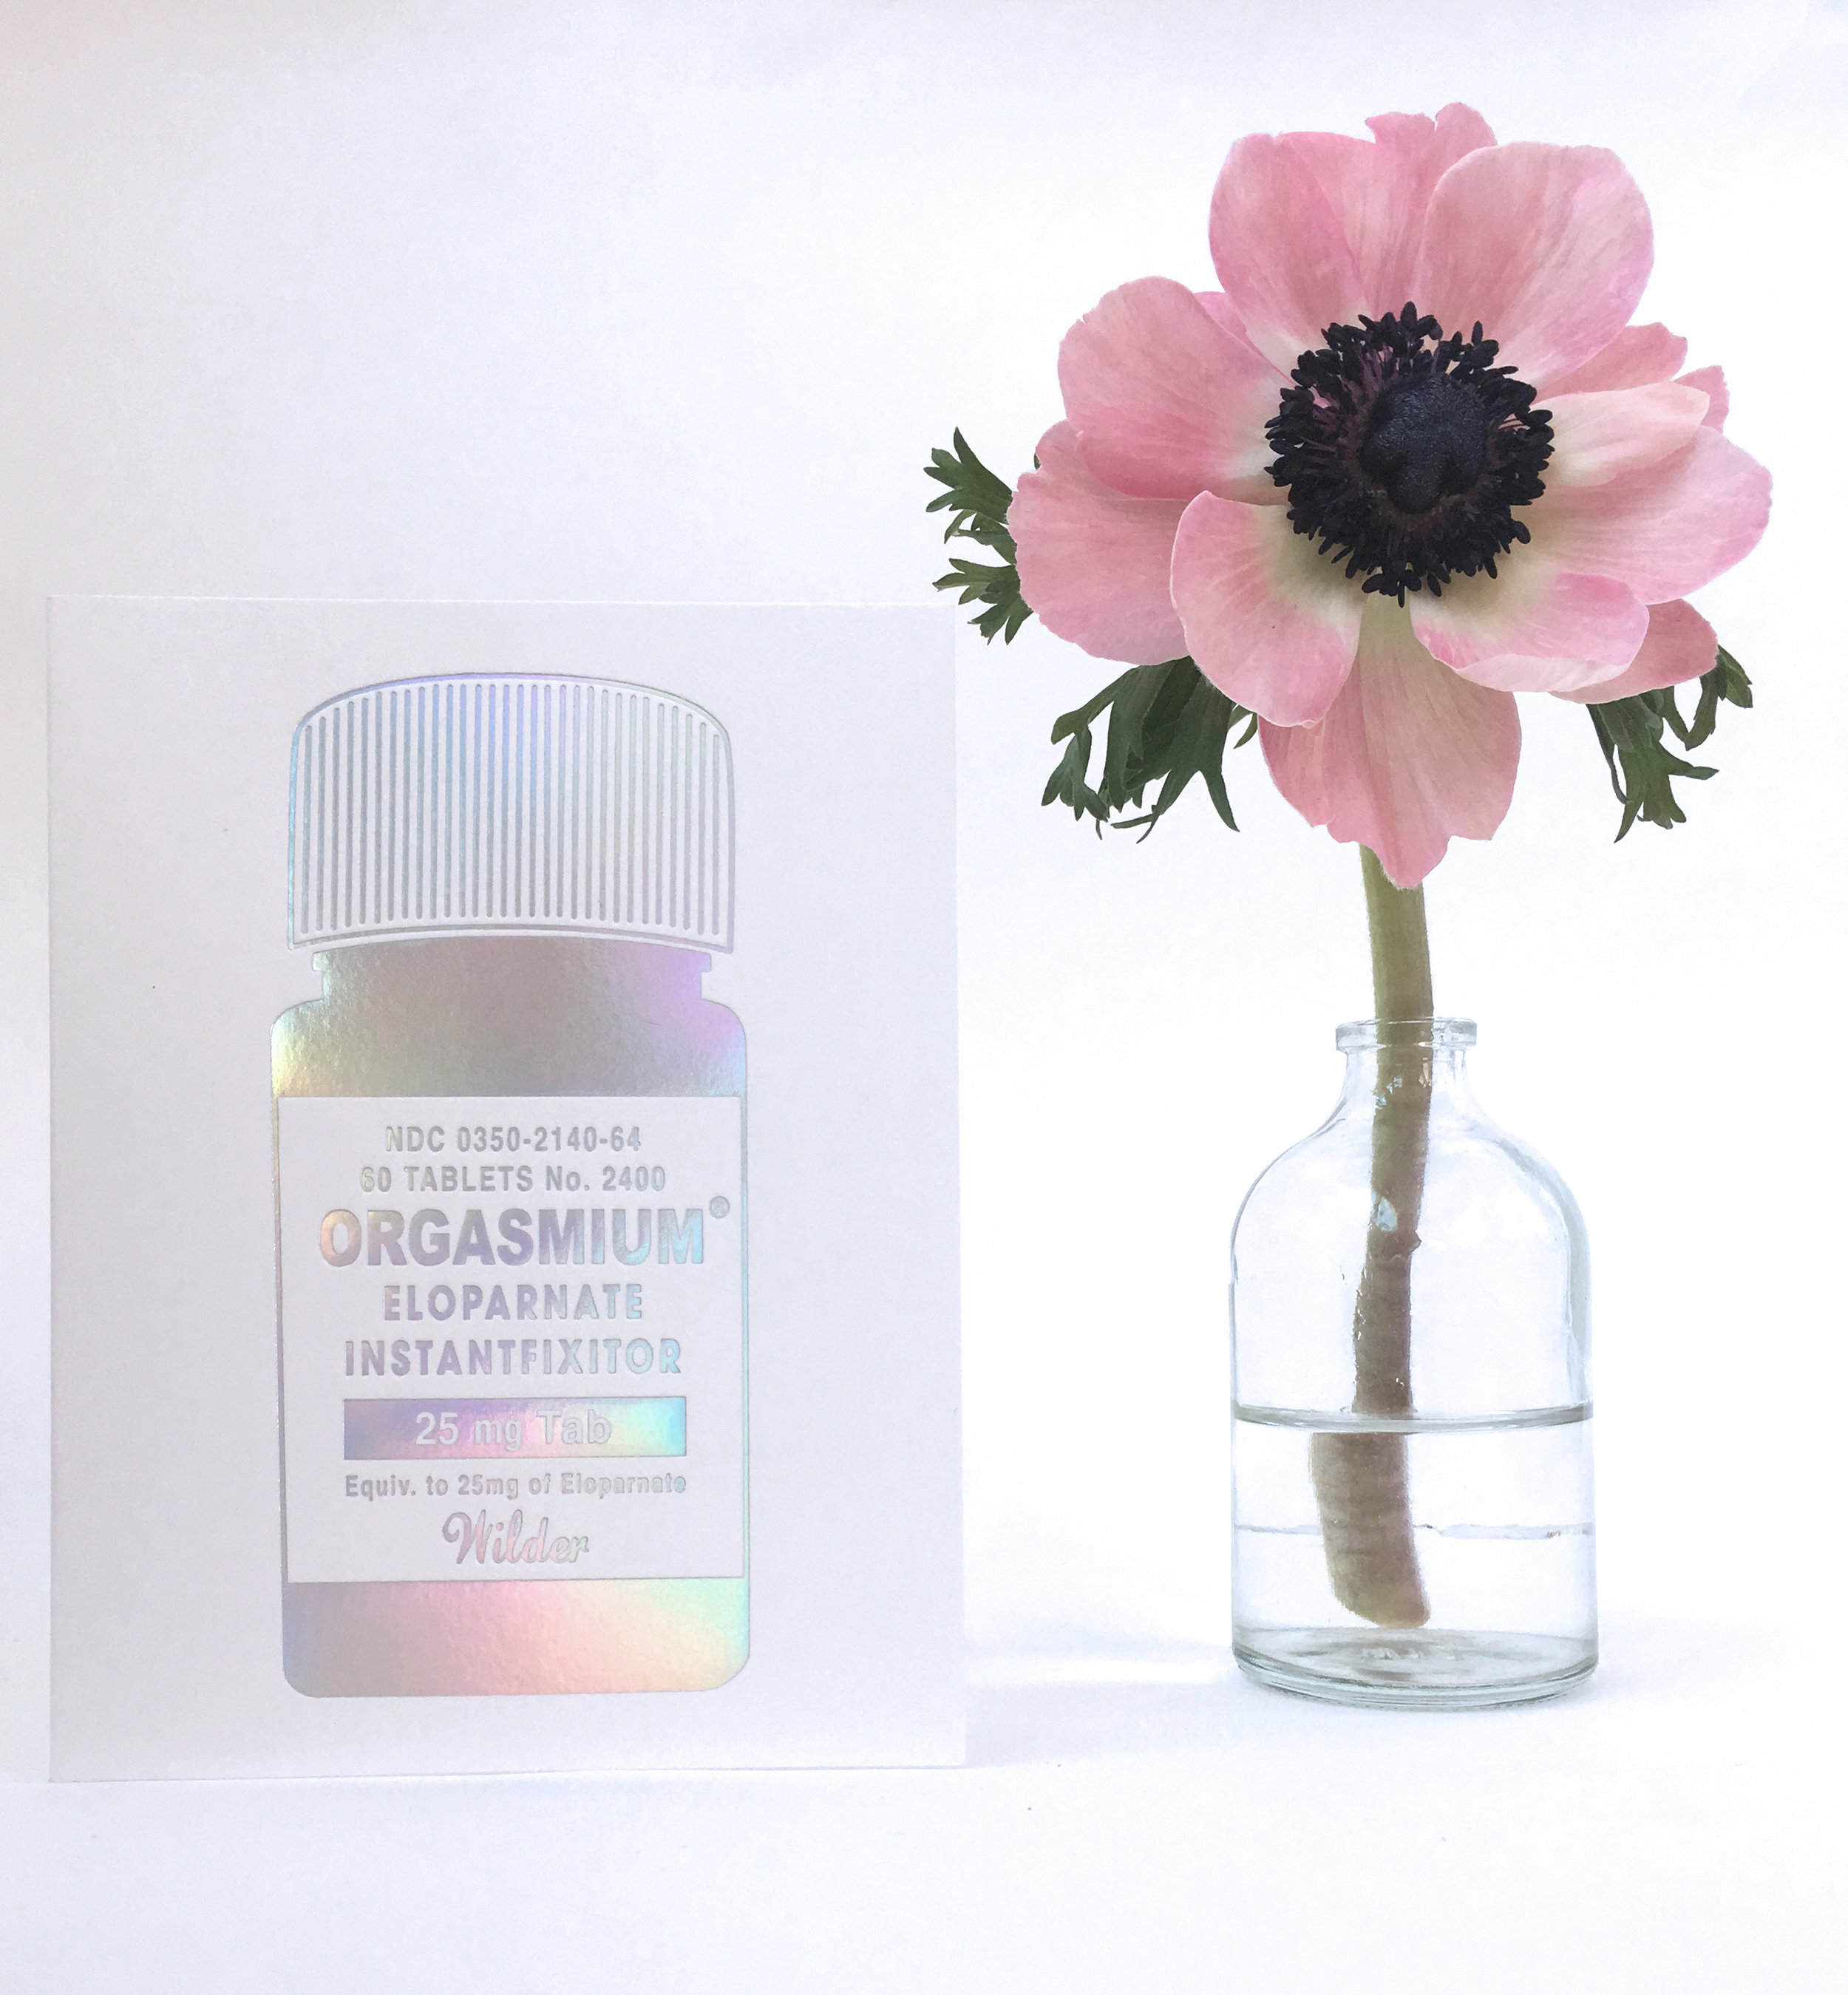 orgasmium card_1.jpg